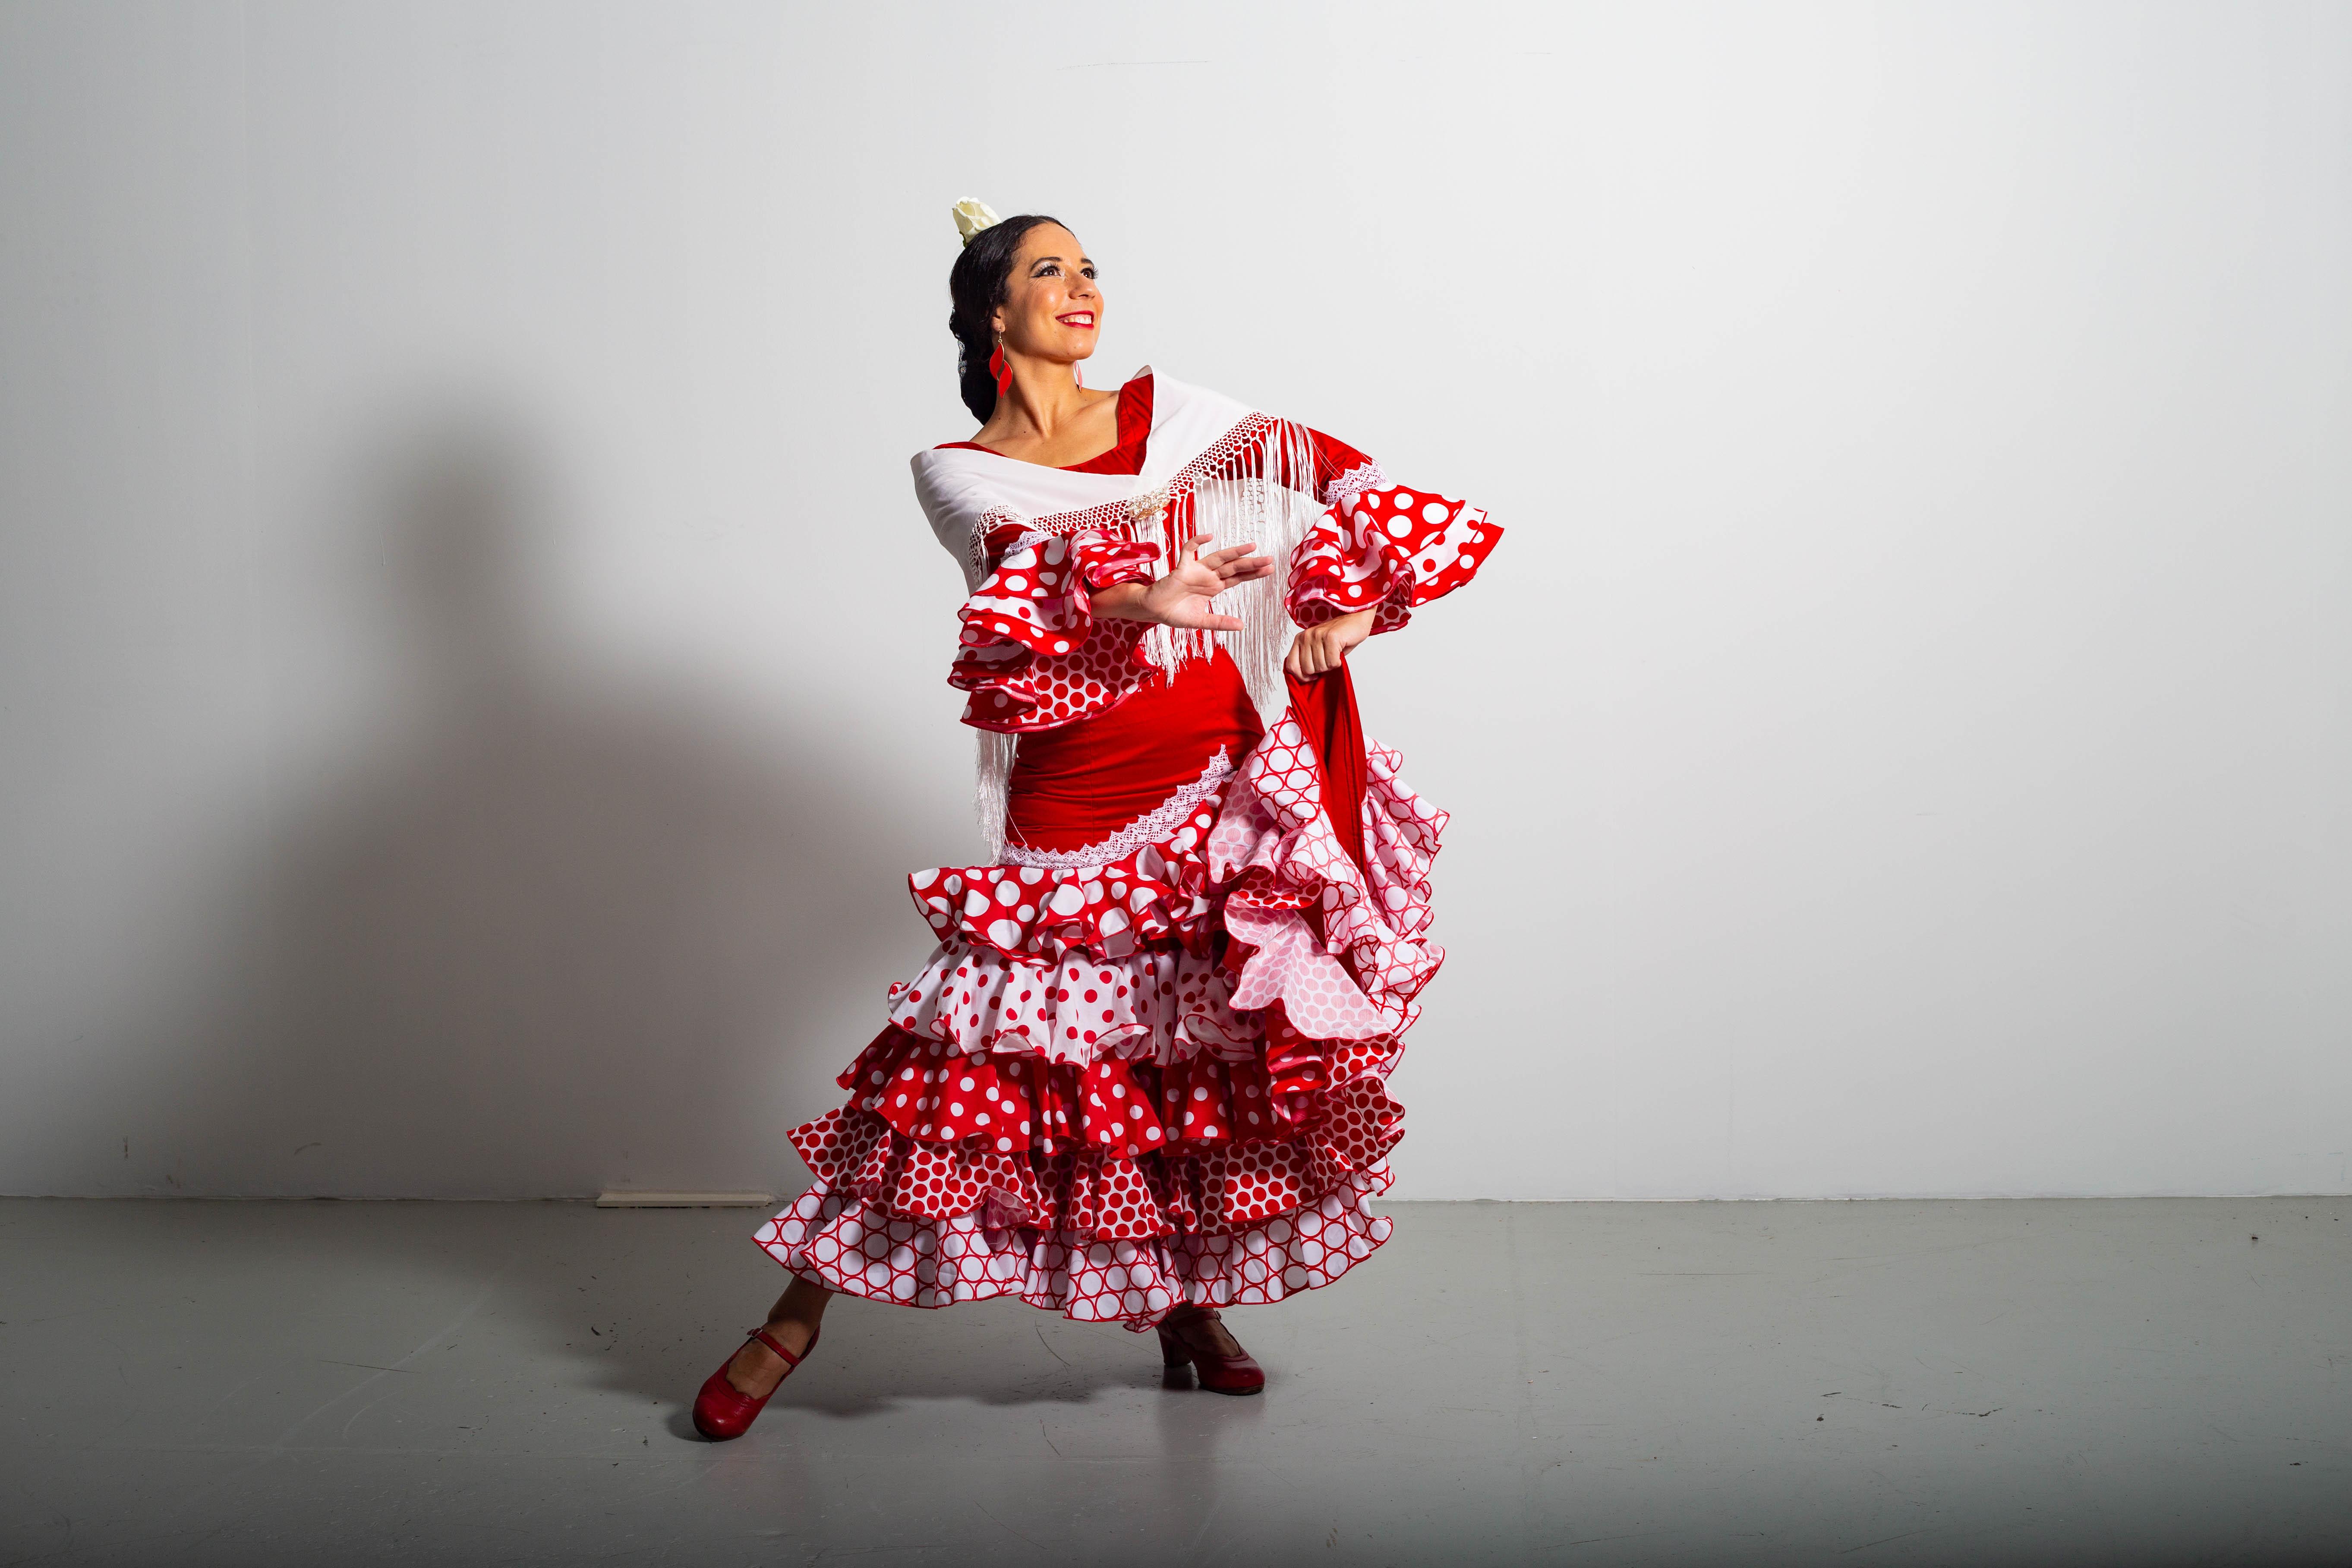 Flamenco dancer for parties in Essex